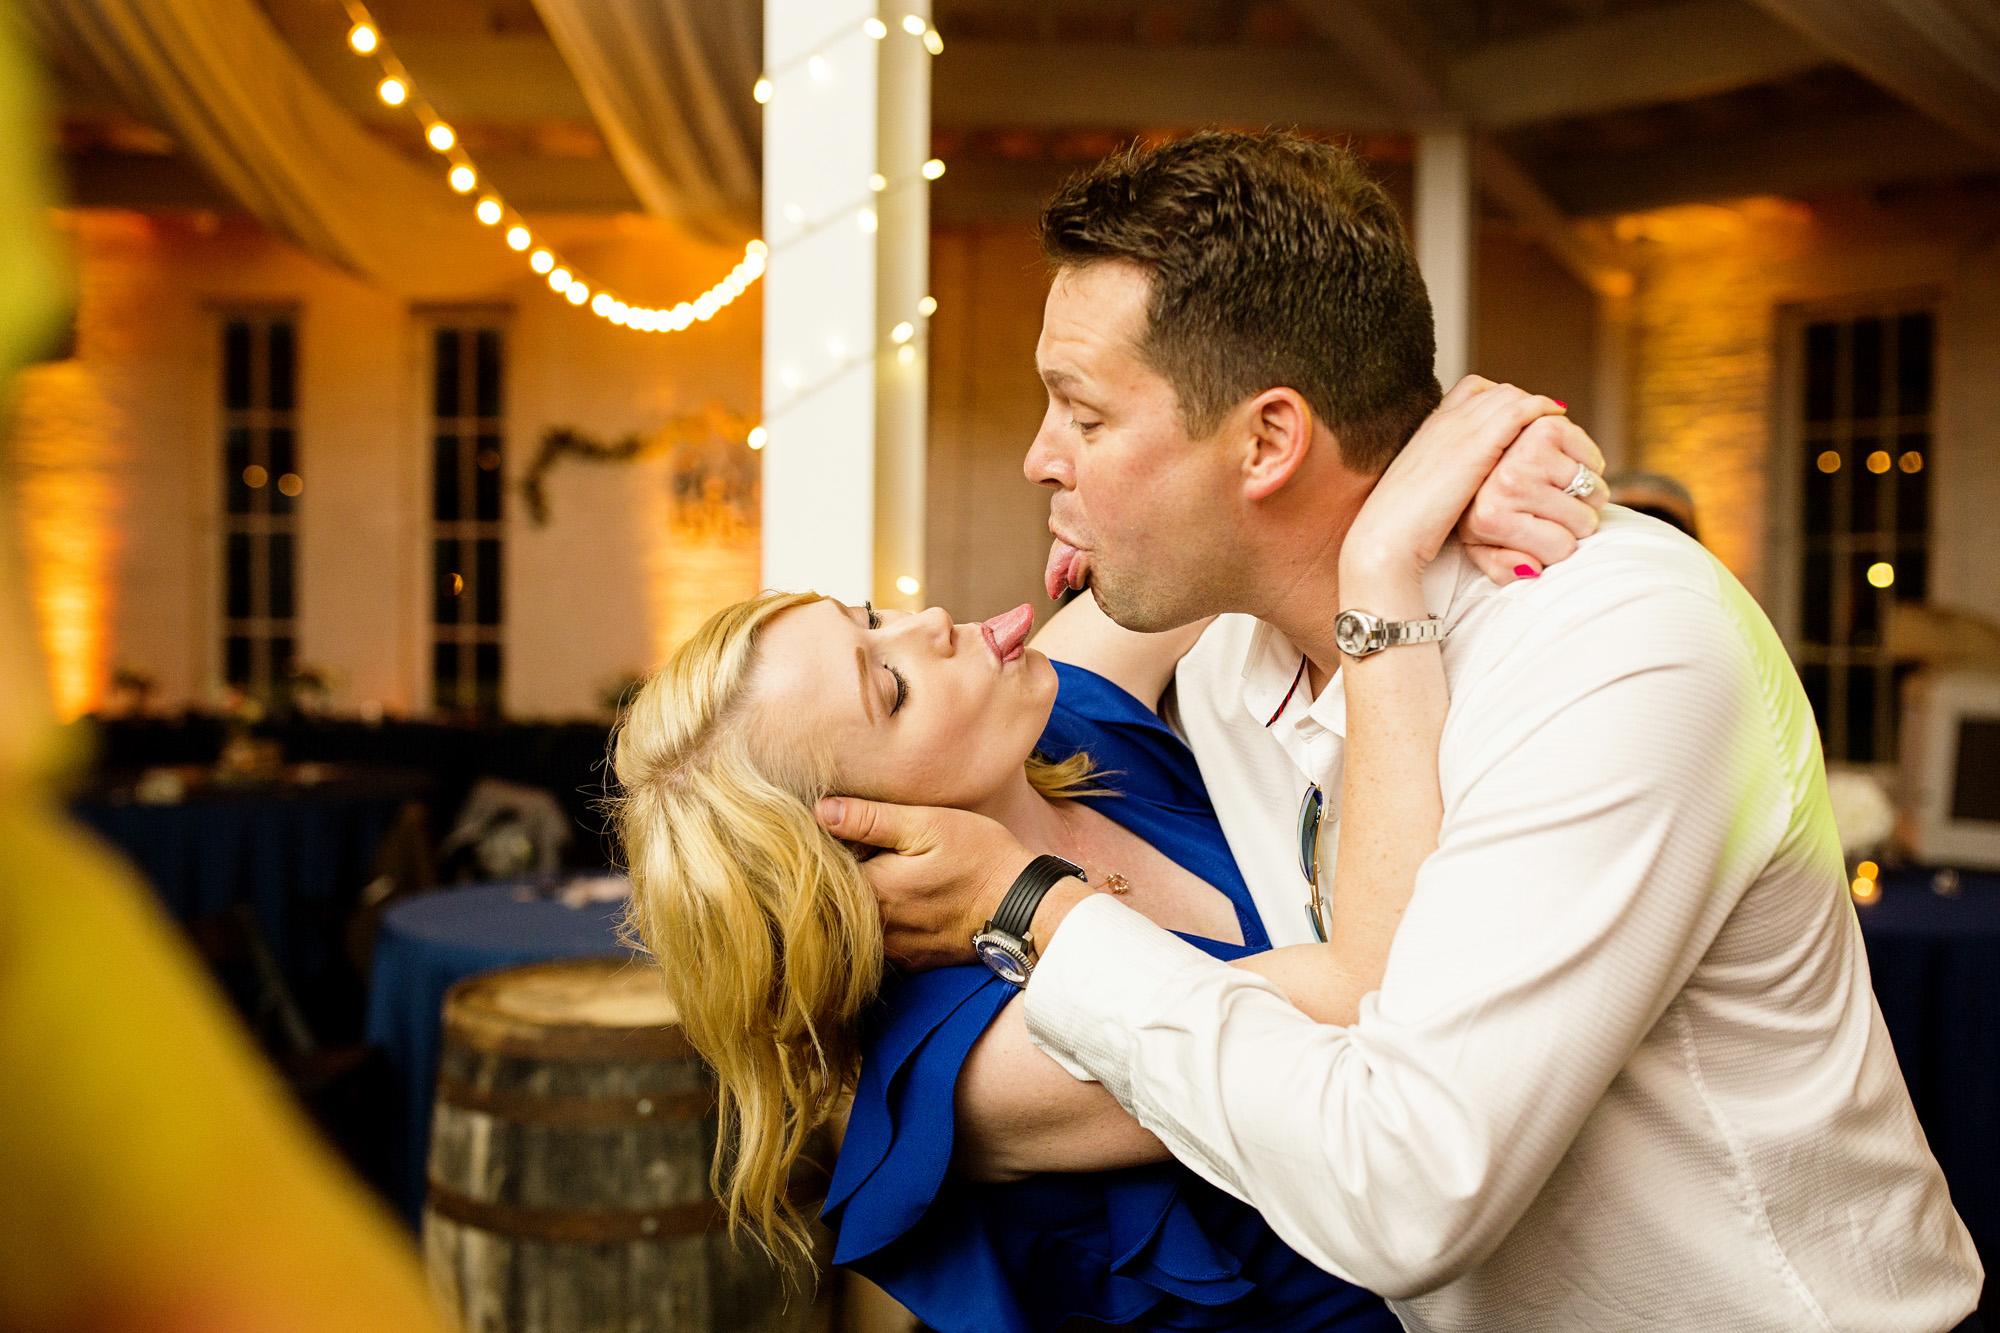 Seriously_Sabrina_Photography_Lexington_Kentucky_Round_Barn_Red_Mile_Stable_of_Memories_Wedding_Hart_135.jpg